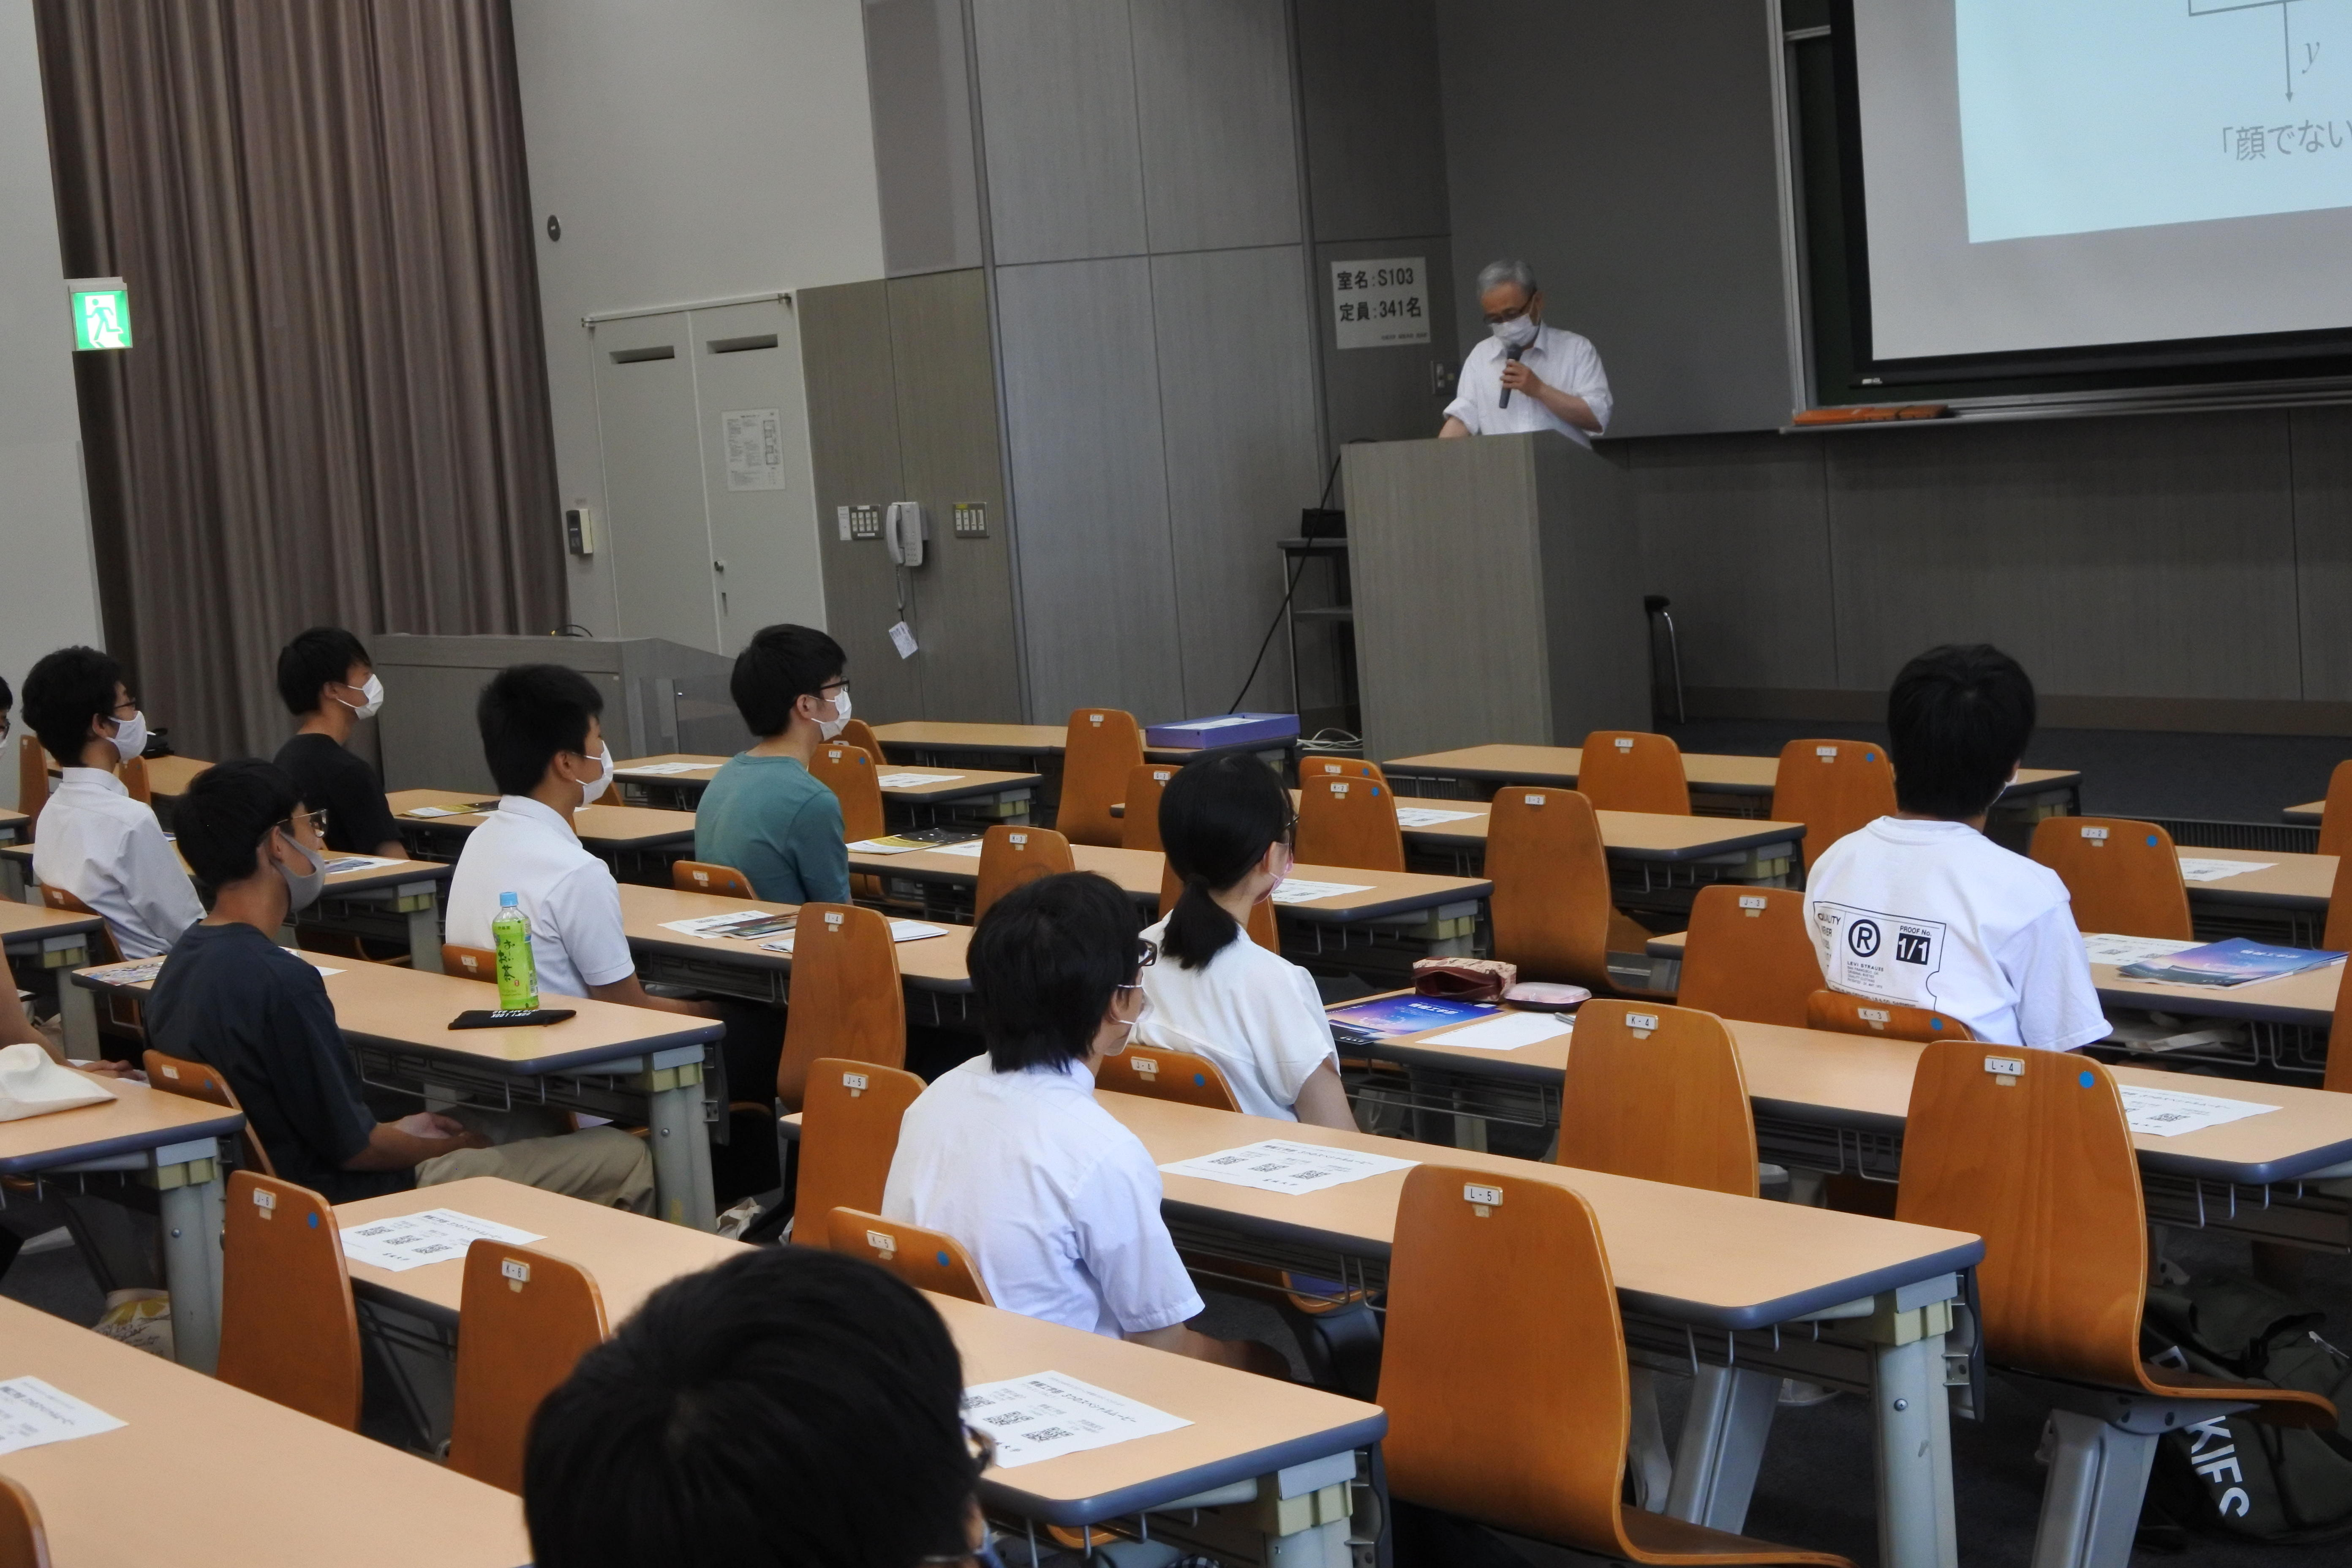 理工学部情報工学科の山田啓一教授による情報工学部の模擬講義